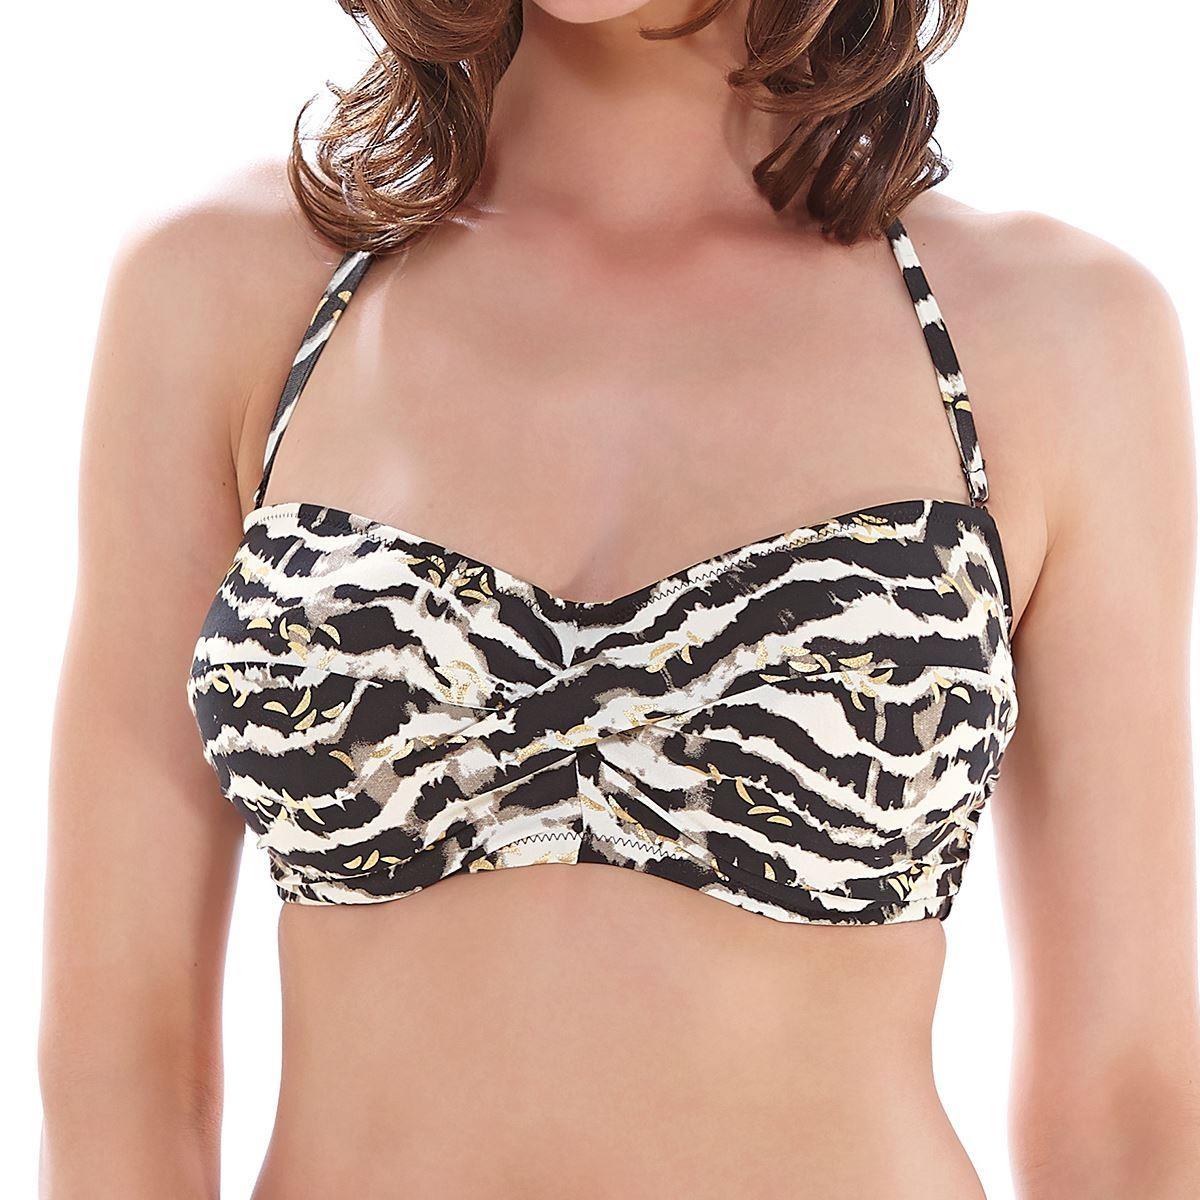 Fantasie Milos Twist Bandeau Bikini Top - Black/Cream